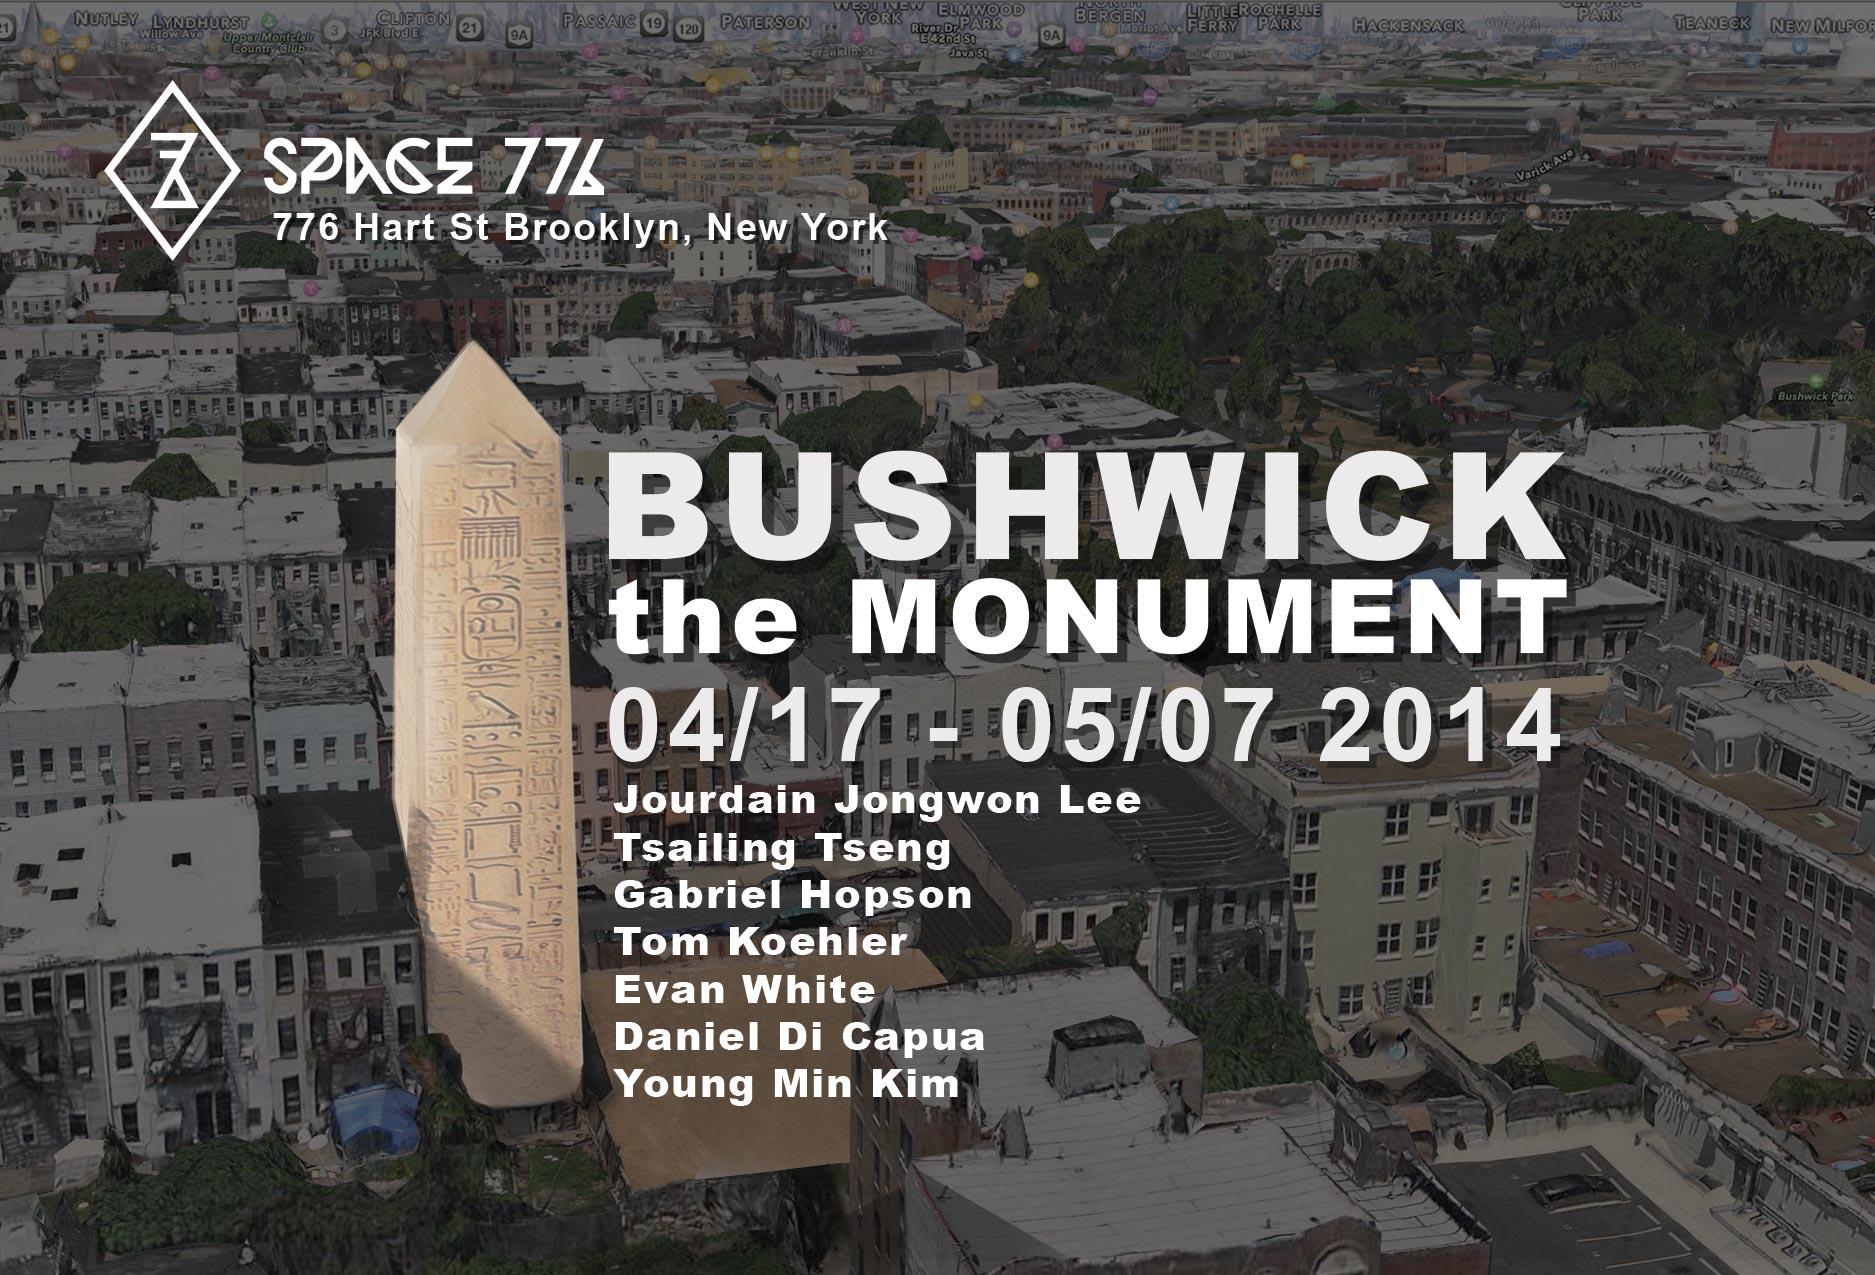 Bushwick The Monument